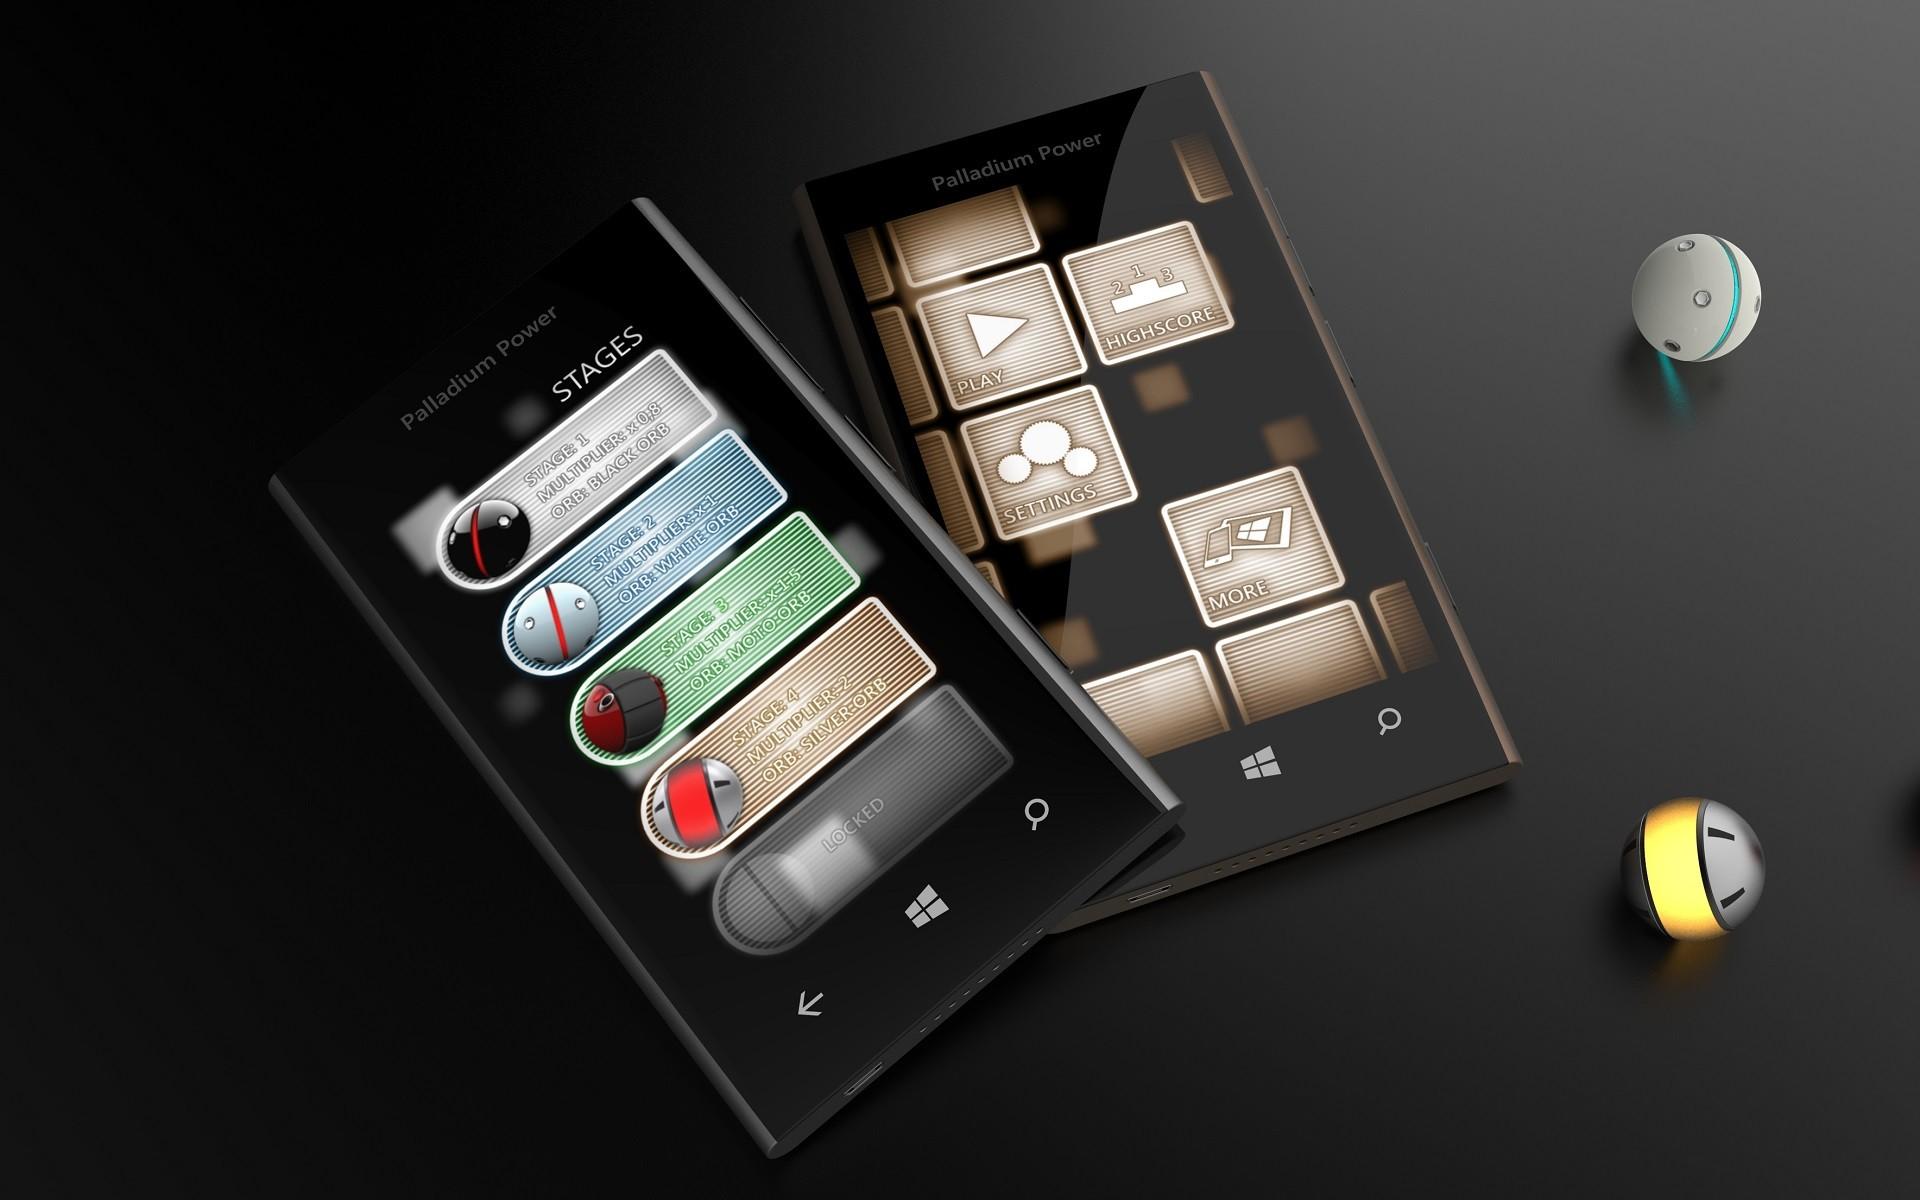 Cars Iphone 7 Wallpaper Minimalistic Futuristic Technology Microsoft Smartphones